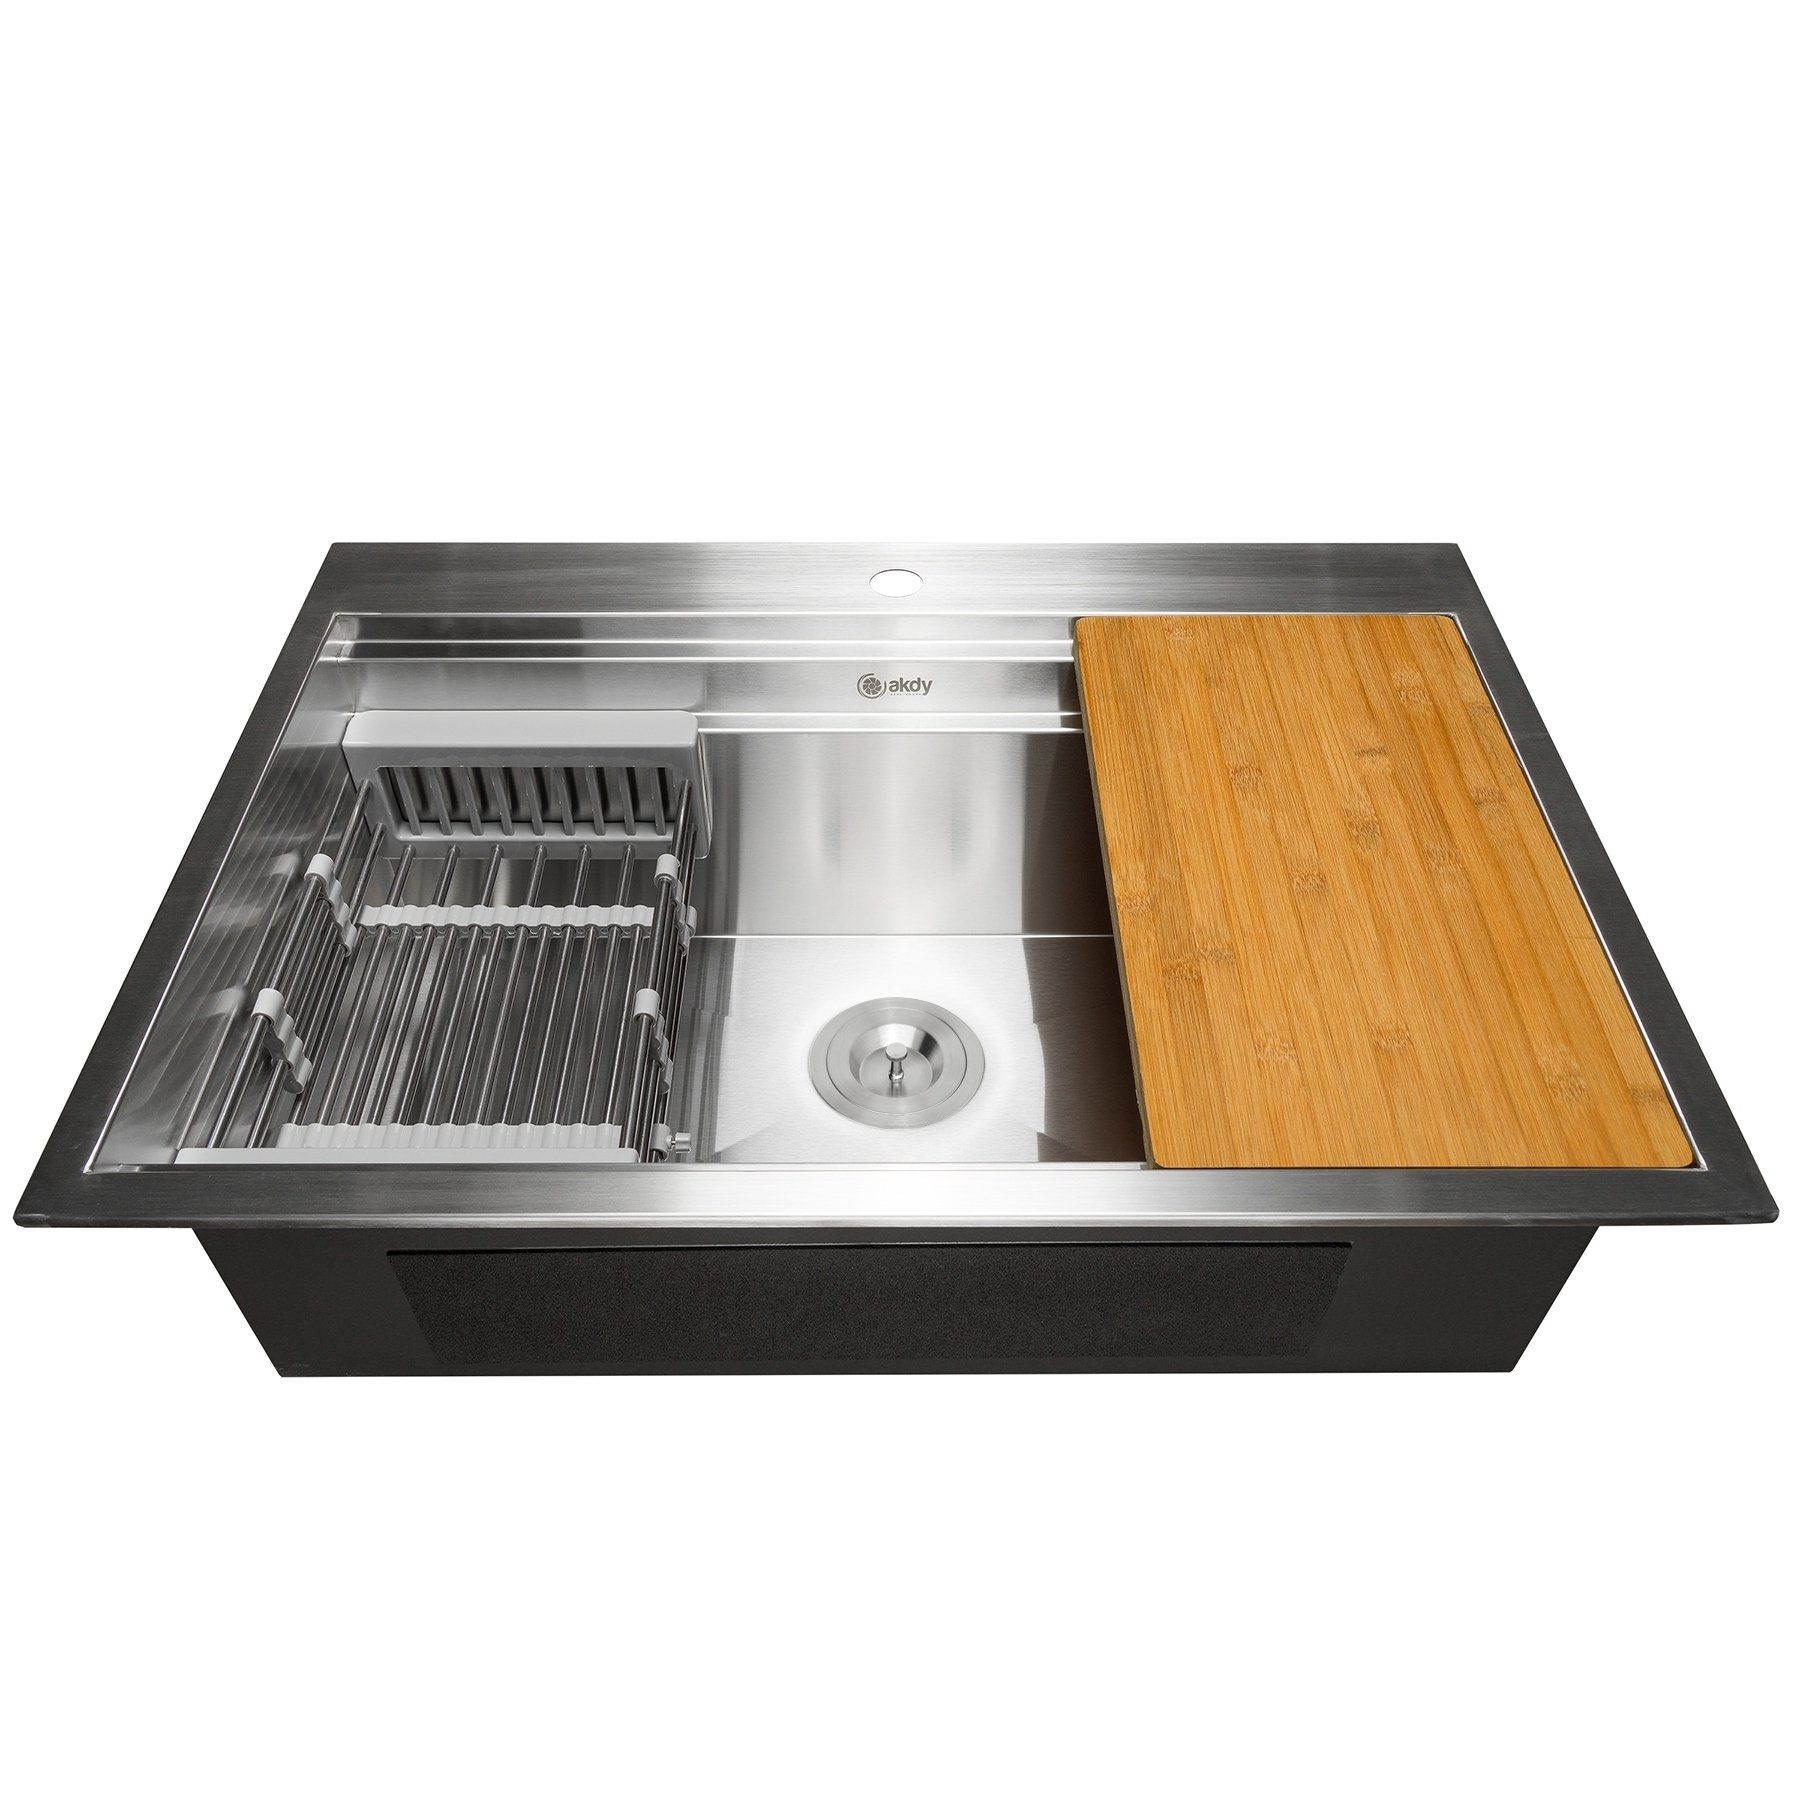 Akdy Ks0235 32 X 22 X 9 Top Mount Handmade Stainless Steel Single Bowl Kitchen Sink Silver Drop In Kitchen Sink Single Bowl Kitchen Sink Top Mount Kitchen Sink